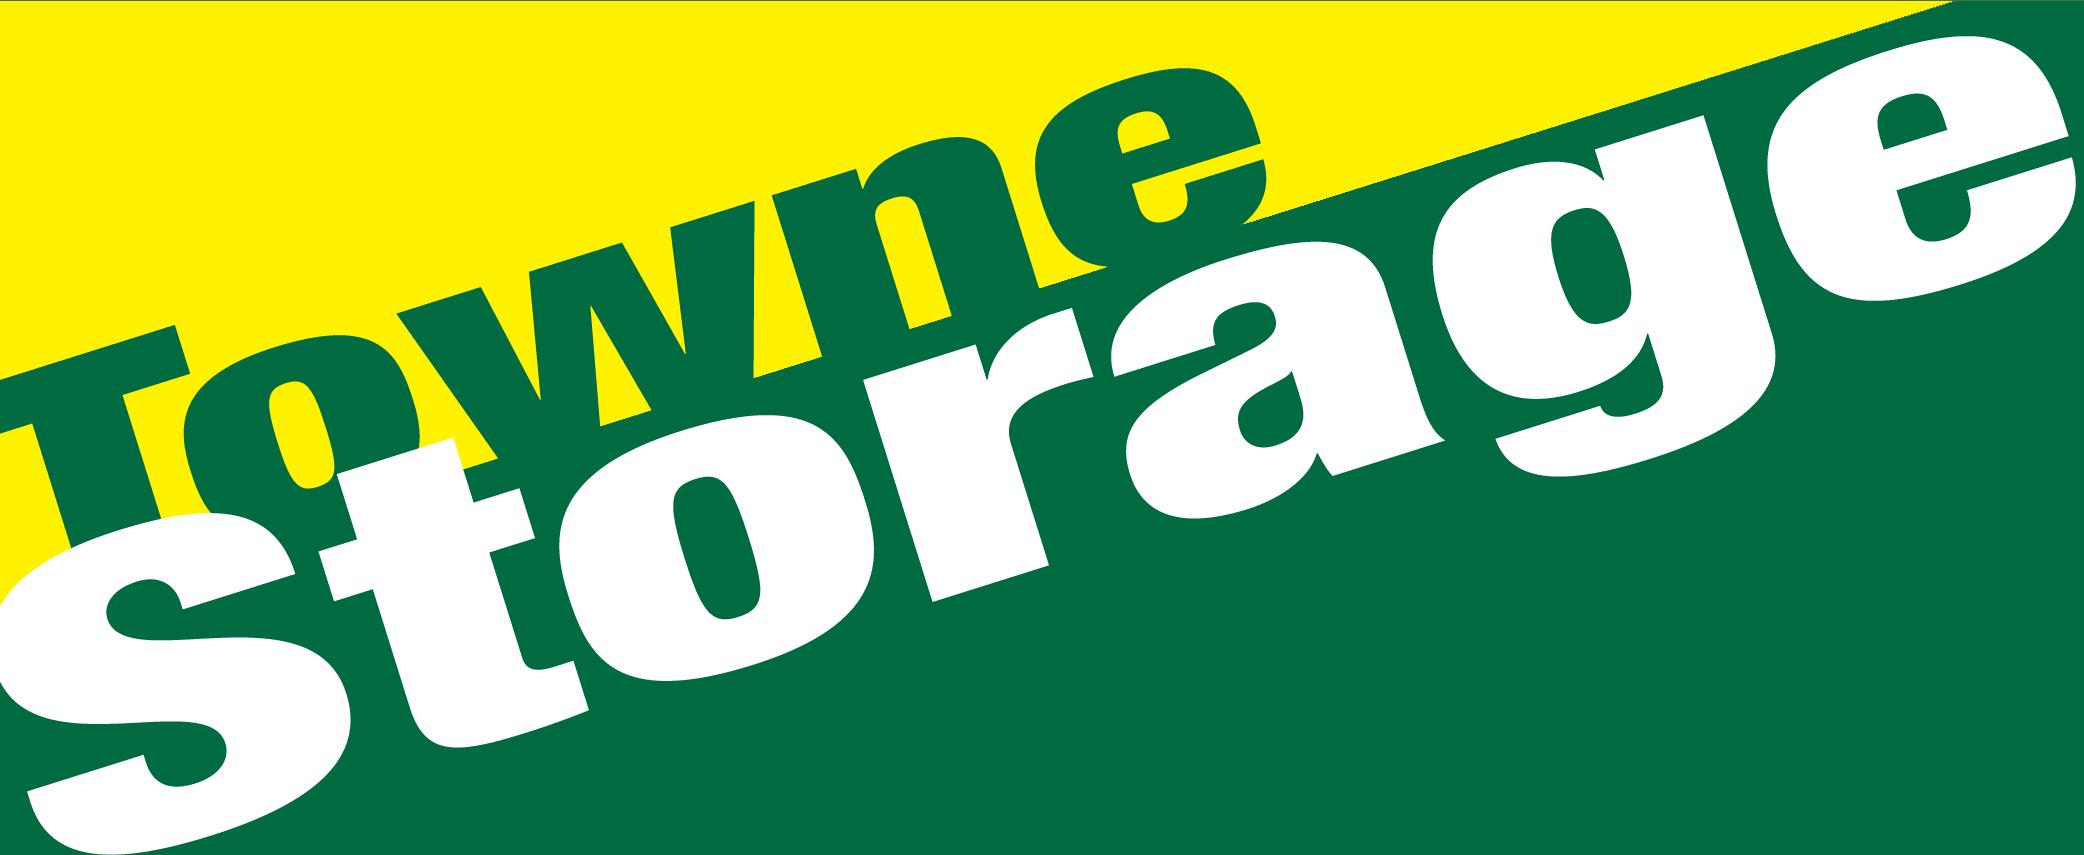 Towne Storage - Riverton logo